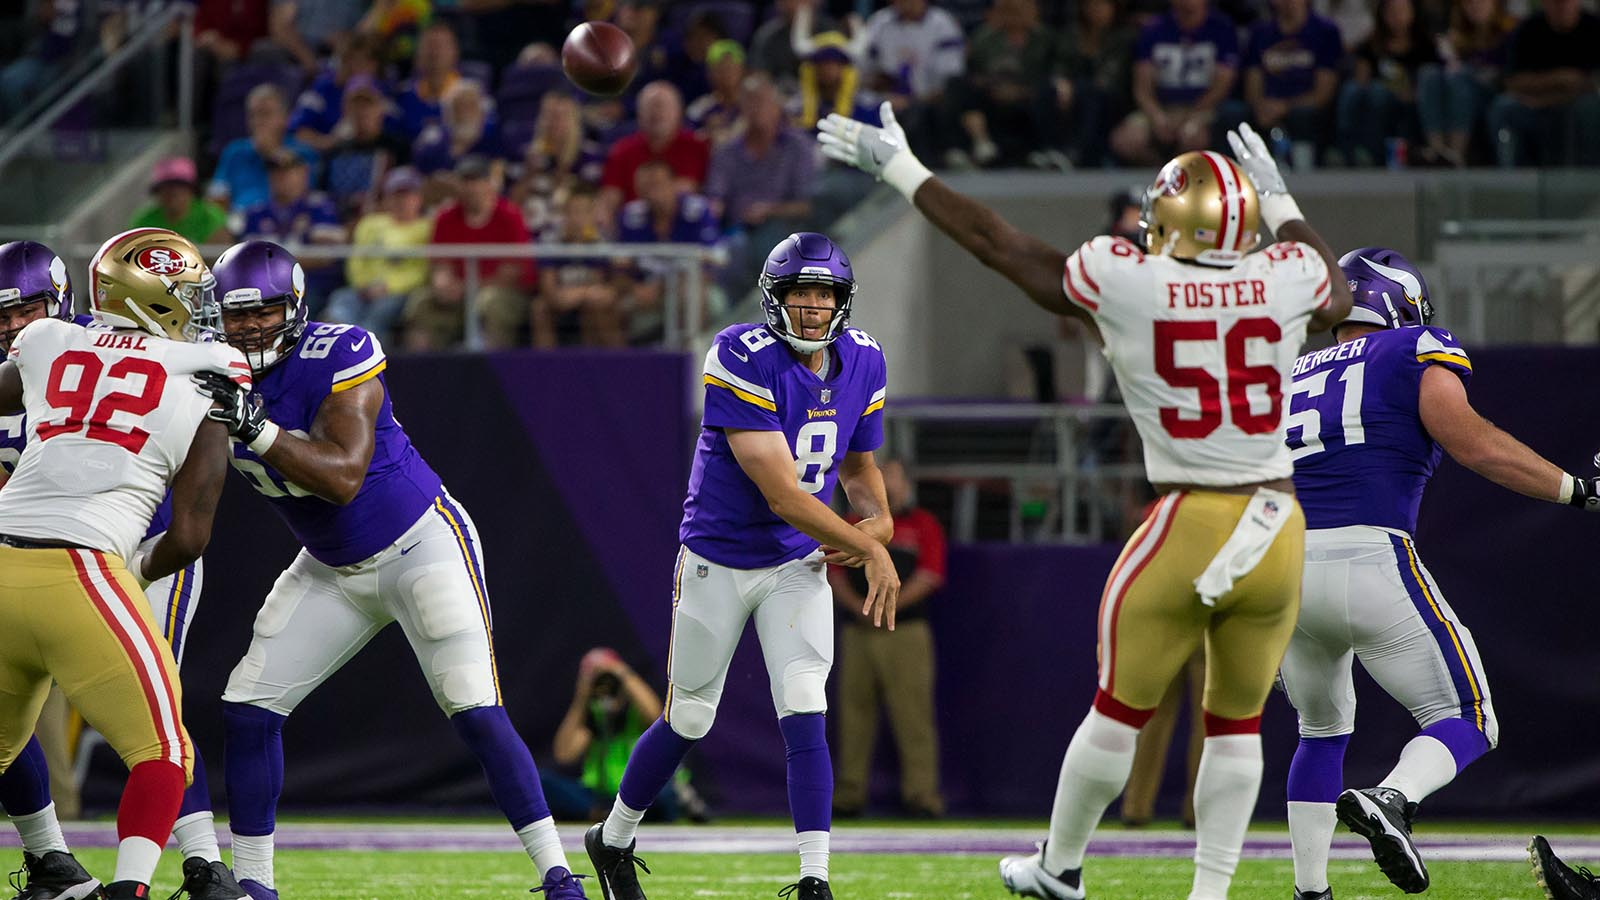 Aug 27, 2017; Minneapolis, MN, USA; Minnesota Vikings quarterback Sam Bradford (8) passes in the second quarter against the San Francisco 49ers at U.S. Bank Stadium. Mandatory Credit: Brad Rempel-USA TODAY Sports